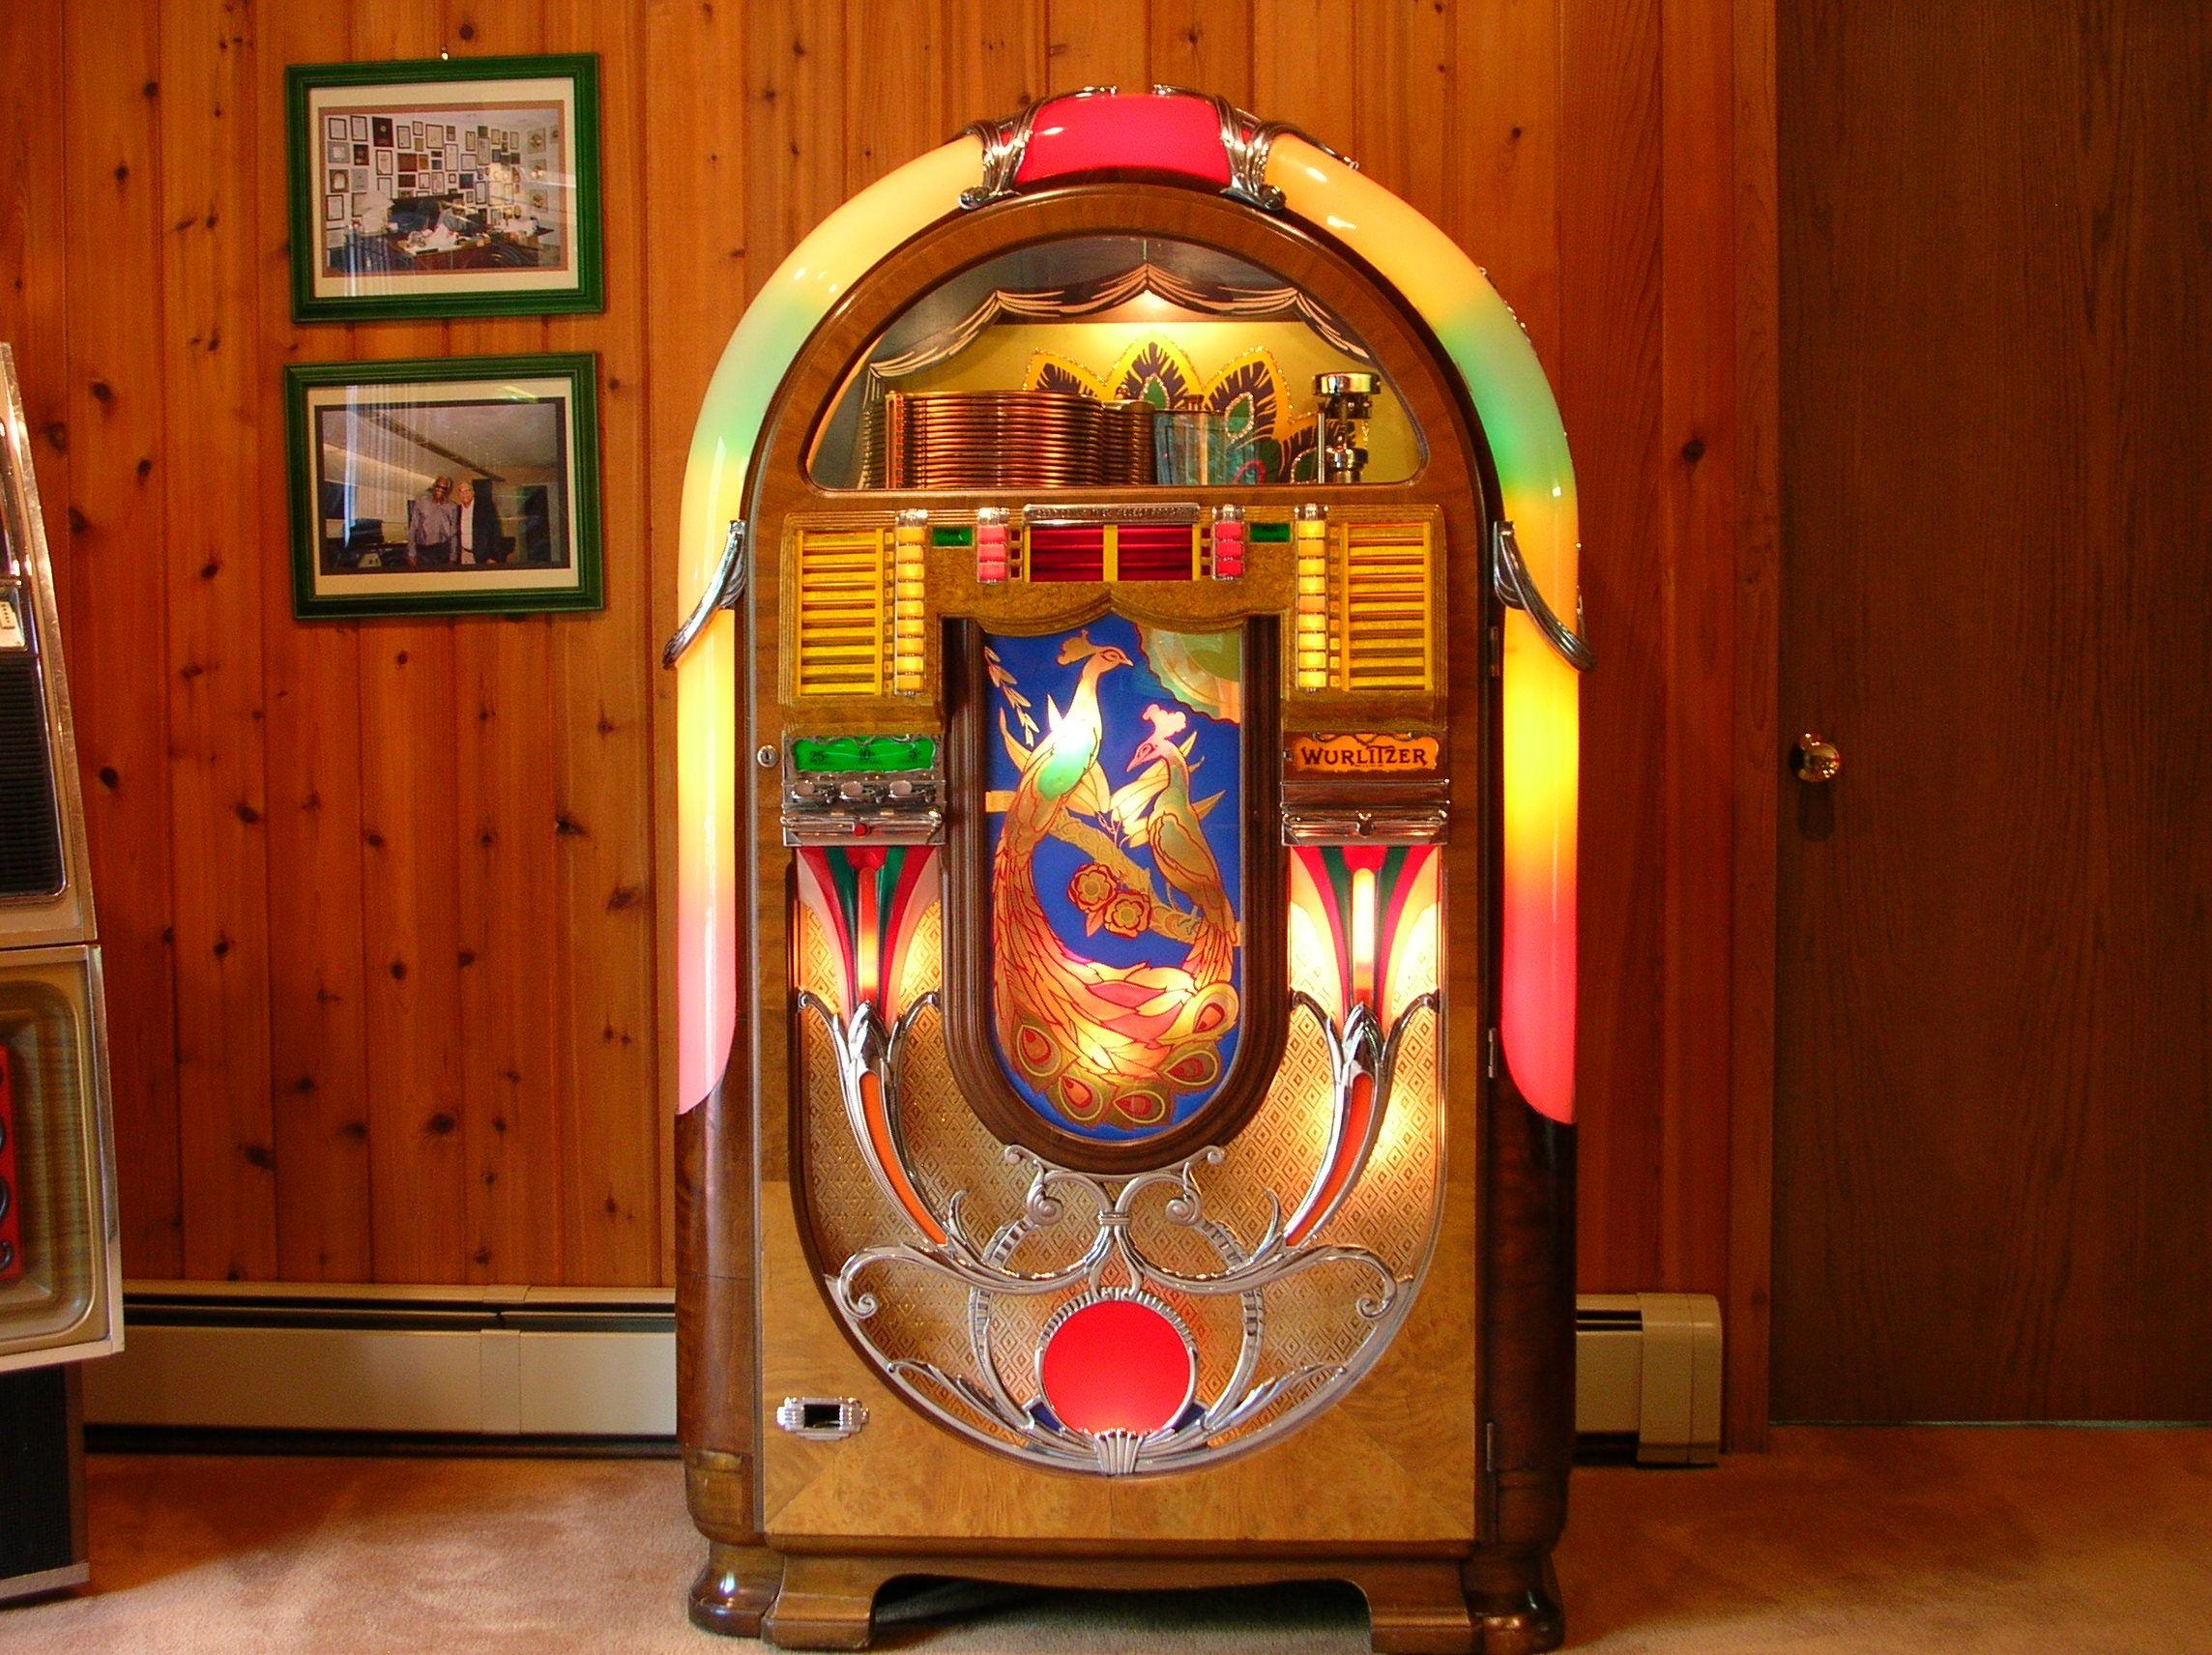 Gameroom   Jukebox, Jukeboxes, Retro